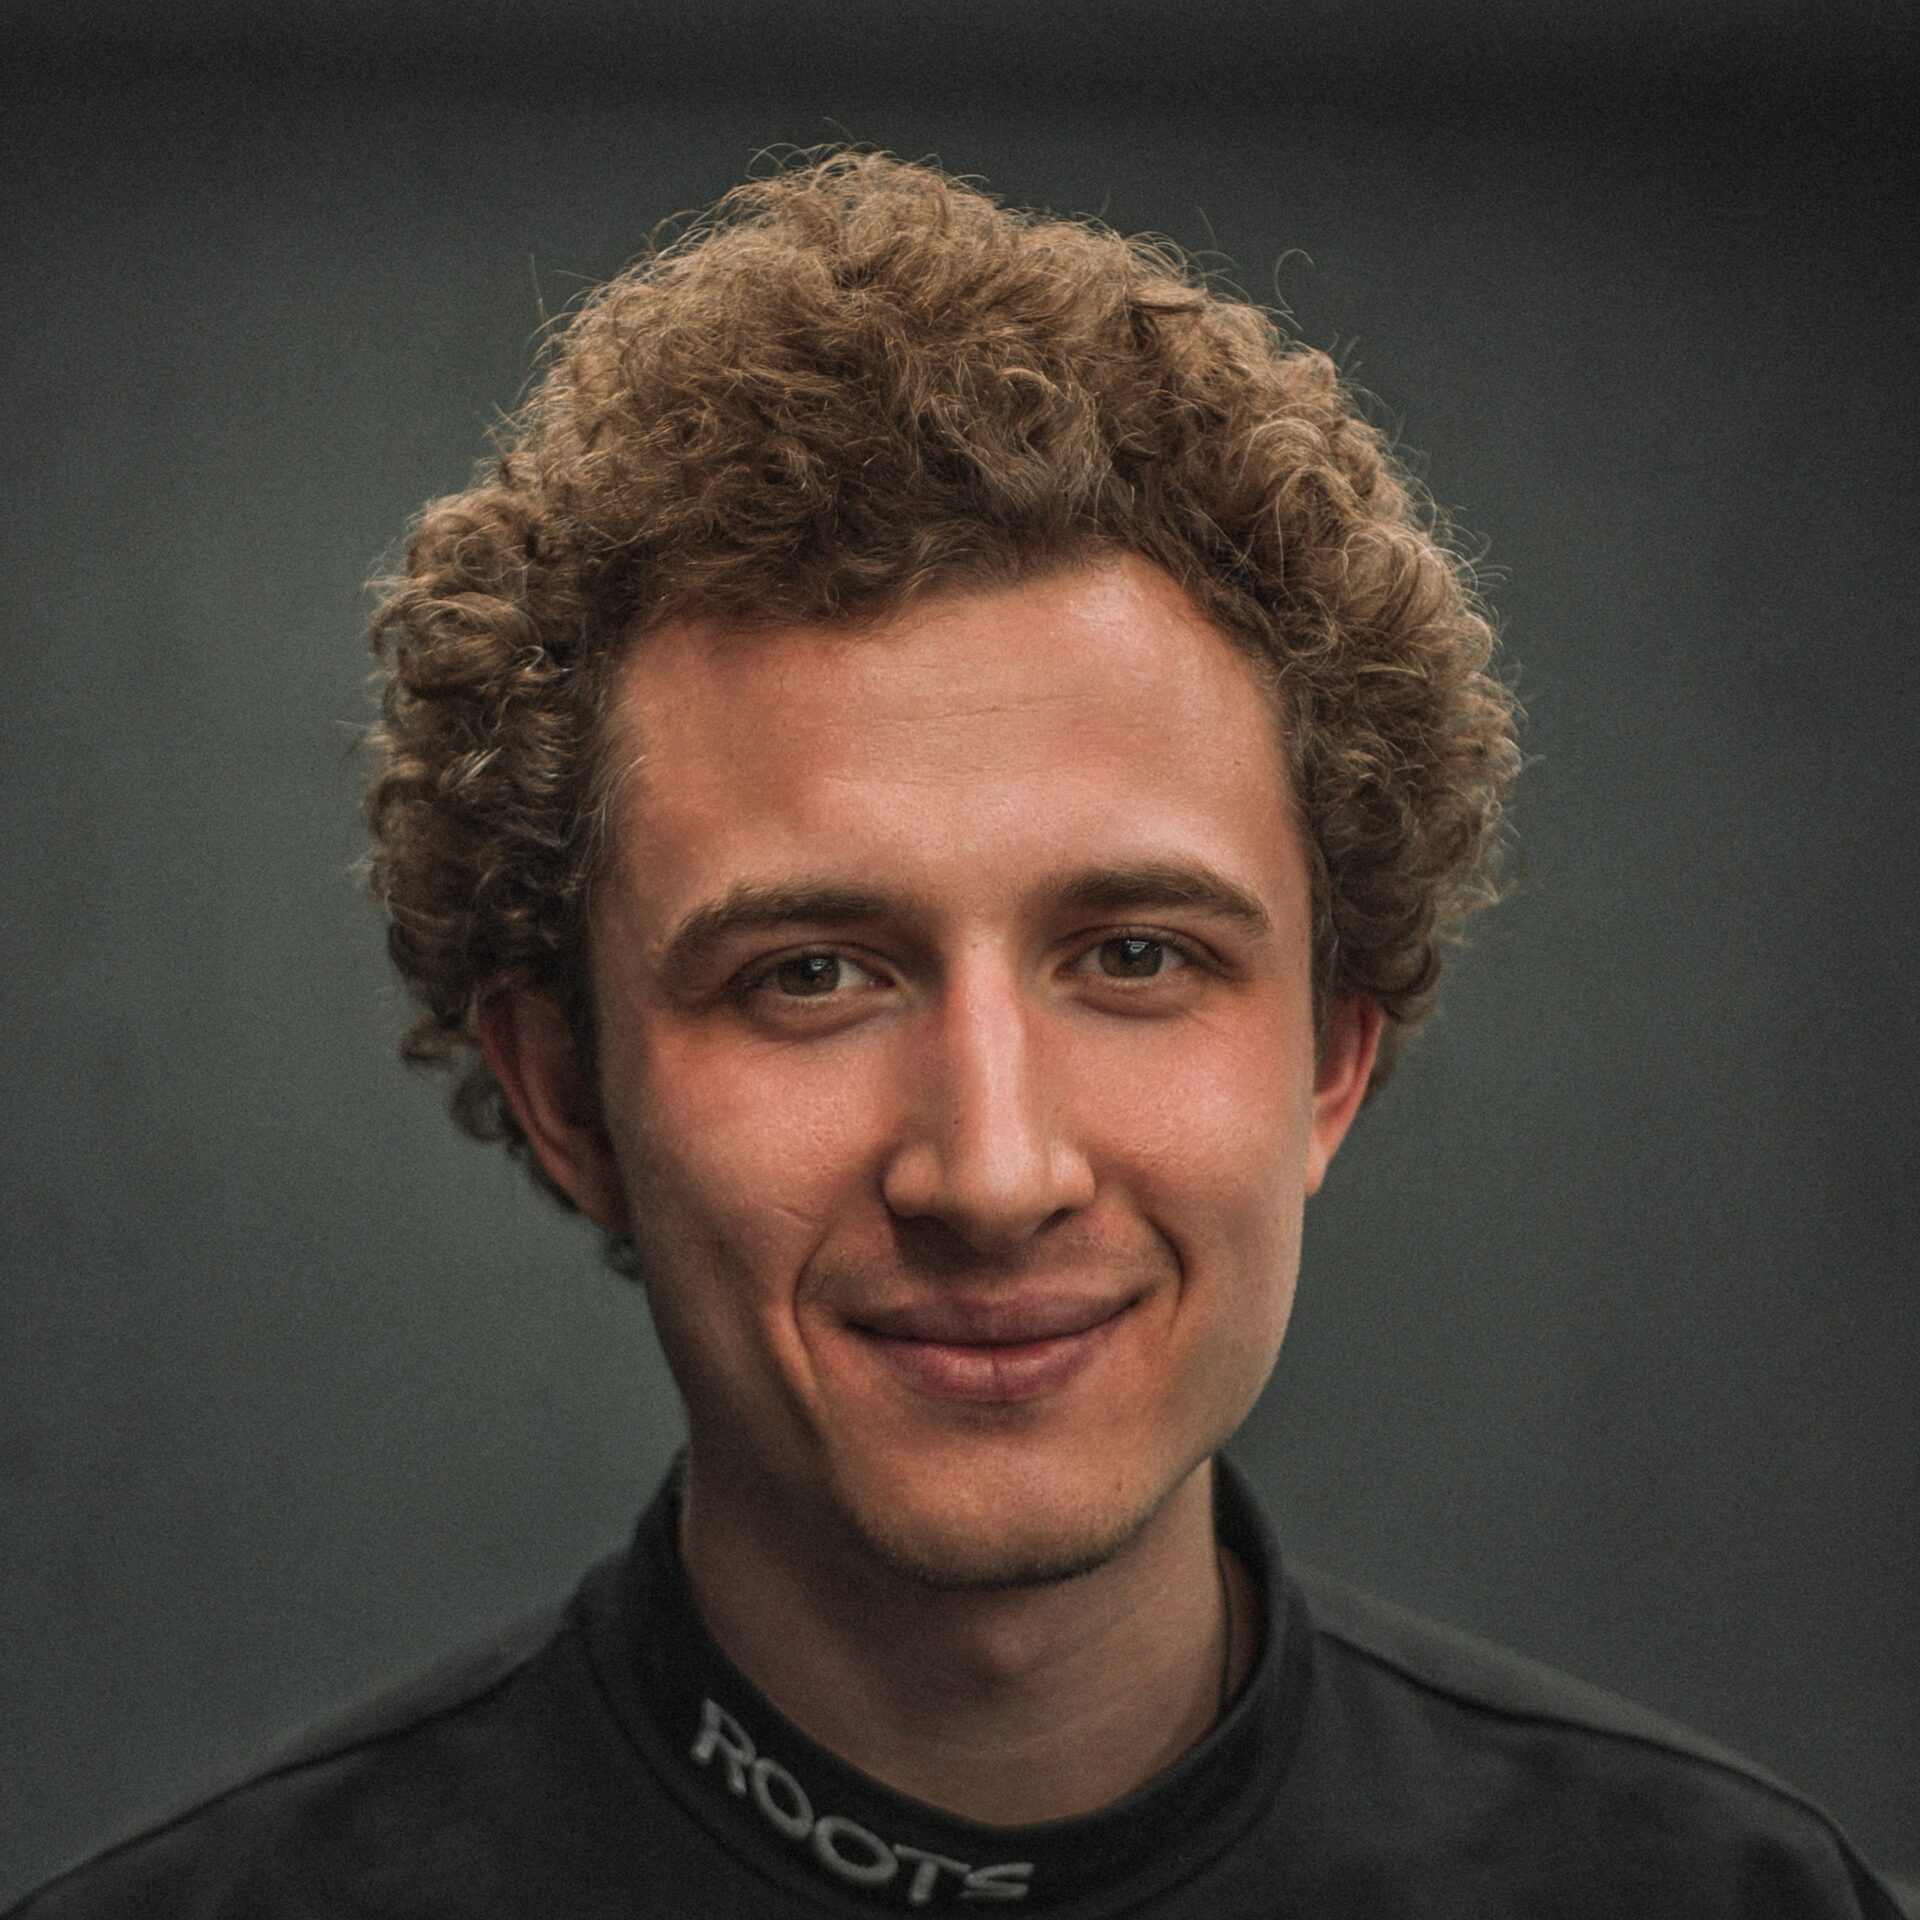 Мастер мужские стрижки Владислав